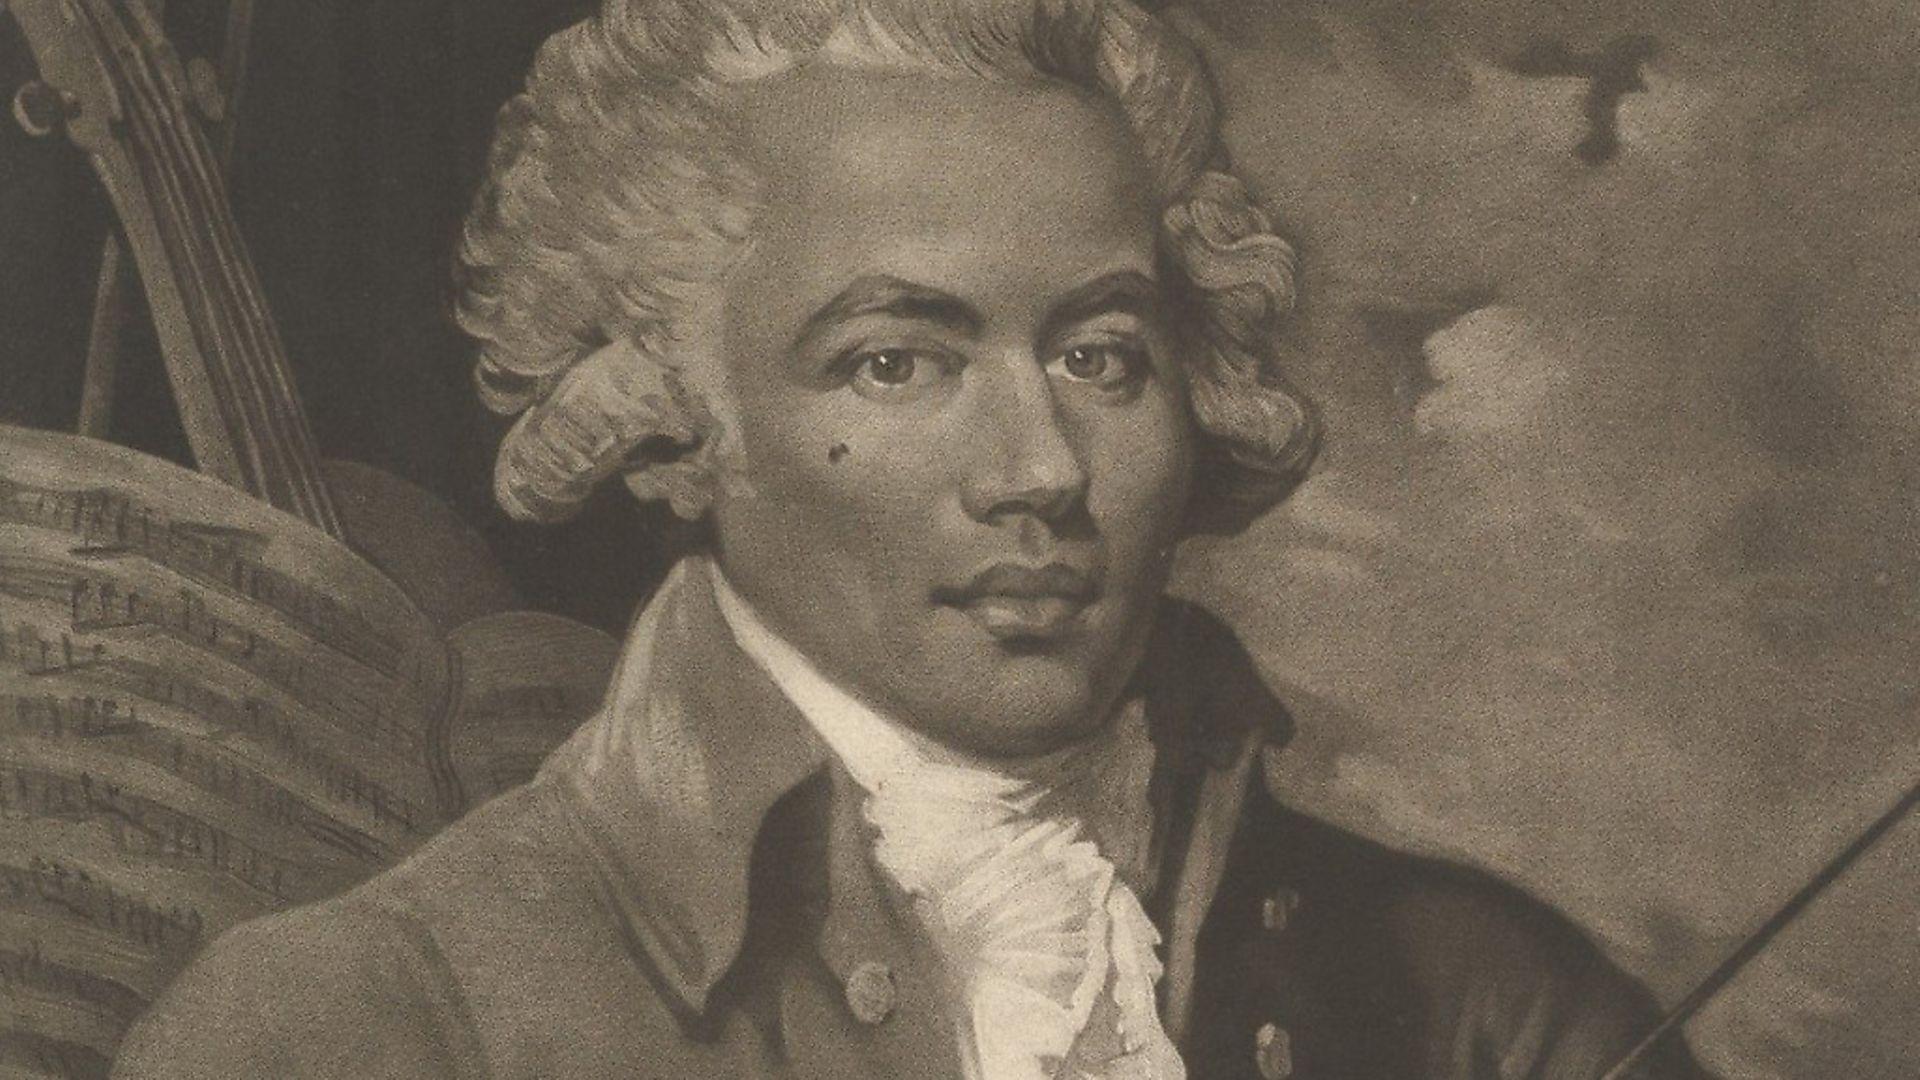 Monsieur de St. George, April 4, 1788. Artist William Ward. (Photo by Heritage Art/Heritage Images via Getty Images) - Credit: Heritage Art/Heritage Images via